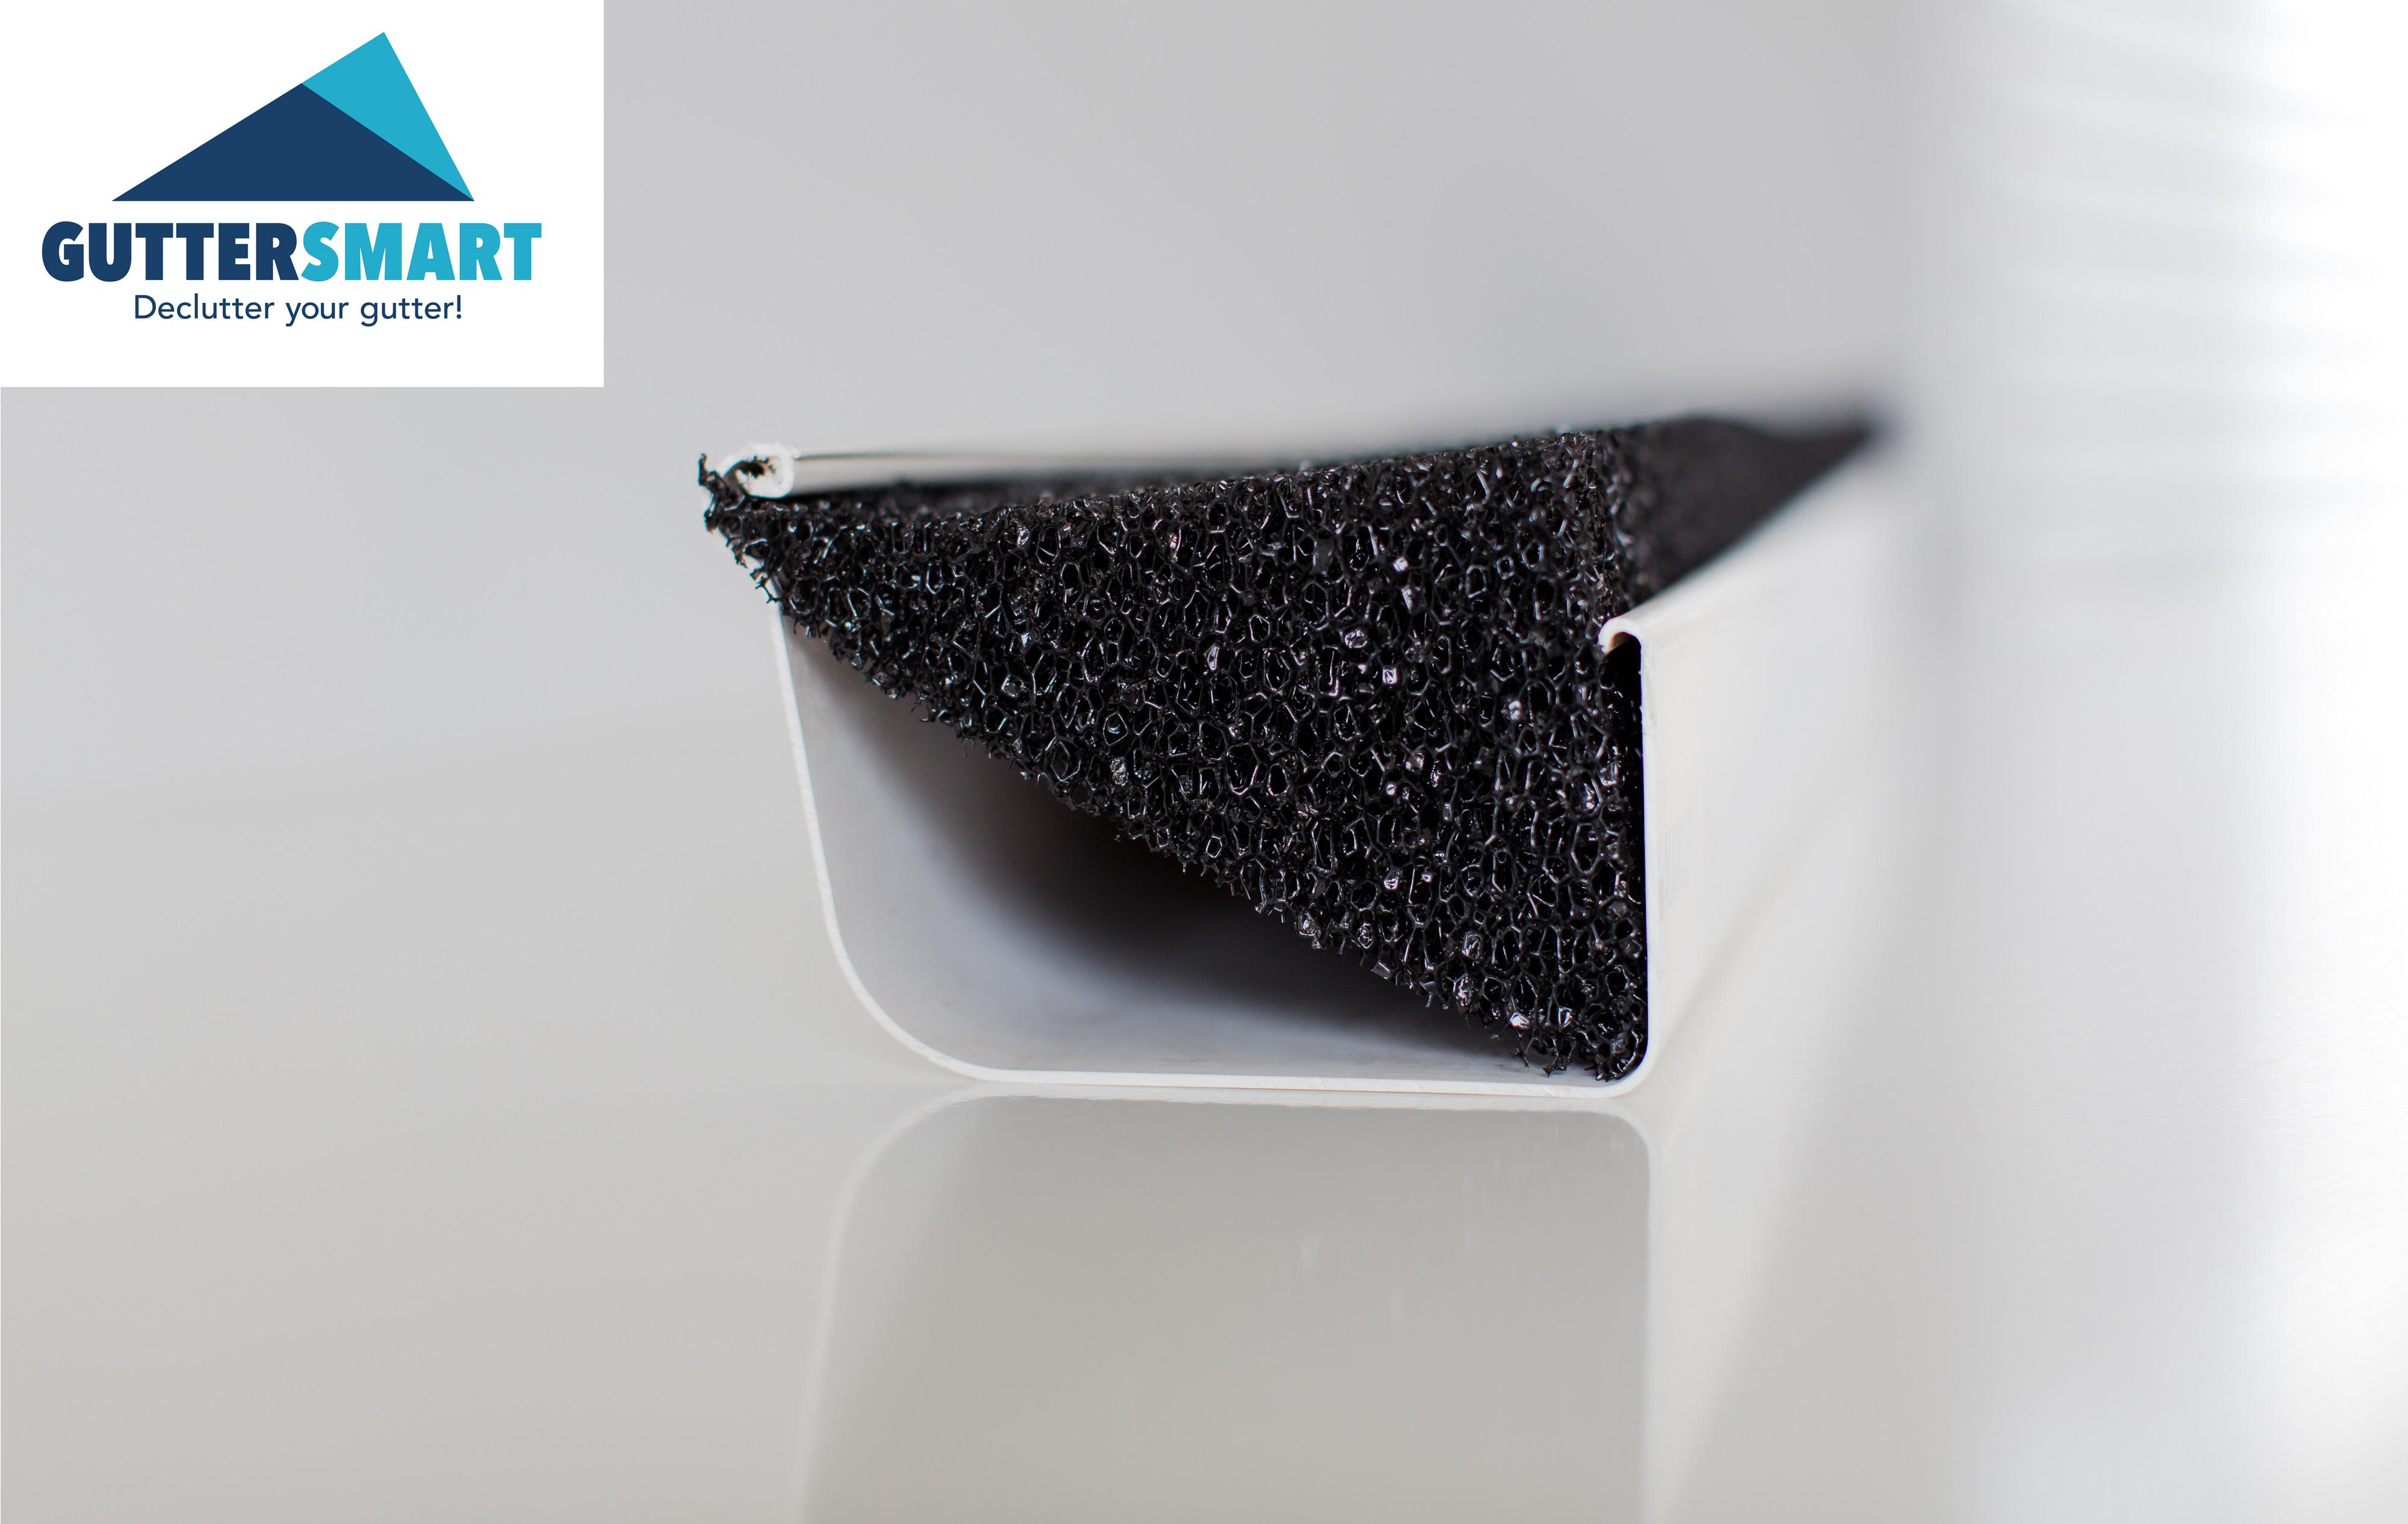 Gutter-protection-foam-guard-Guttersmart-home